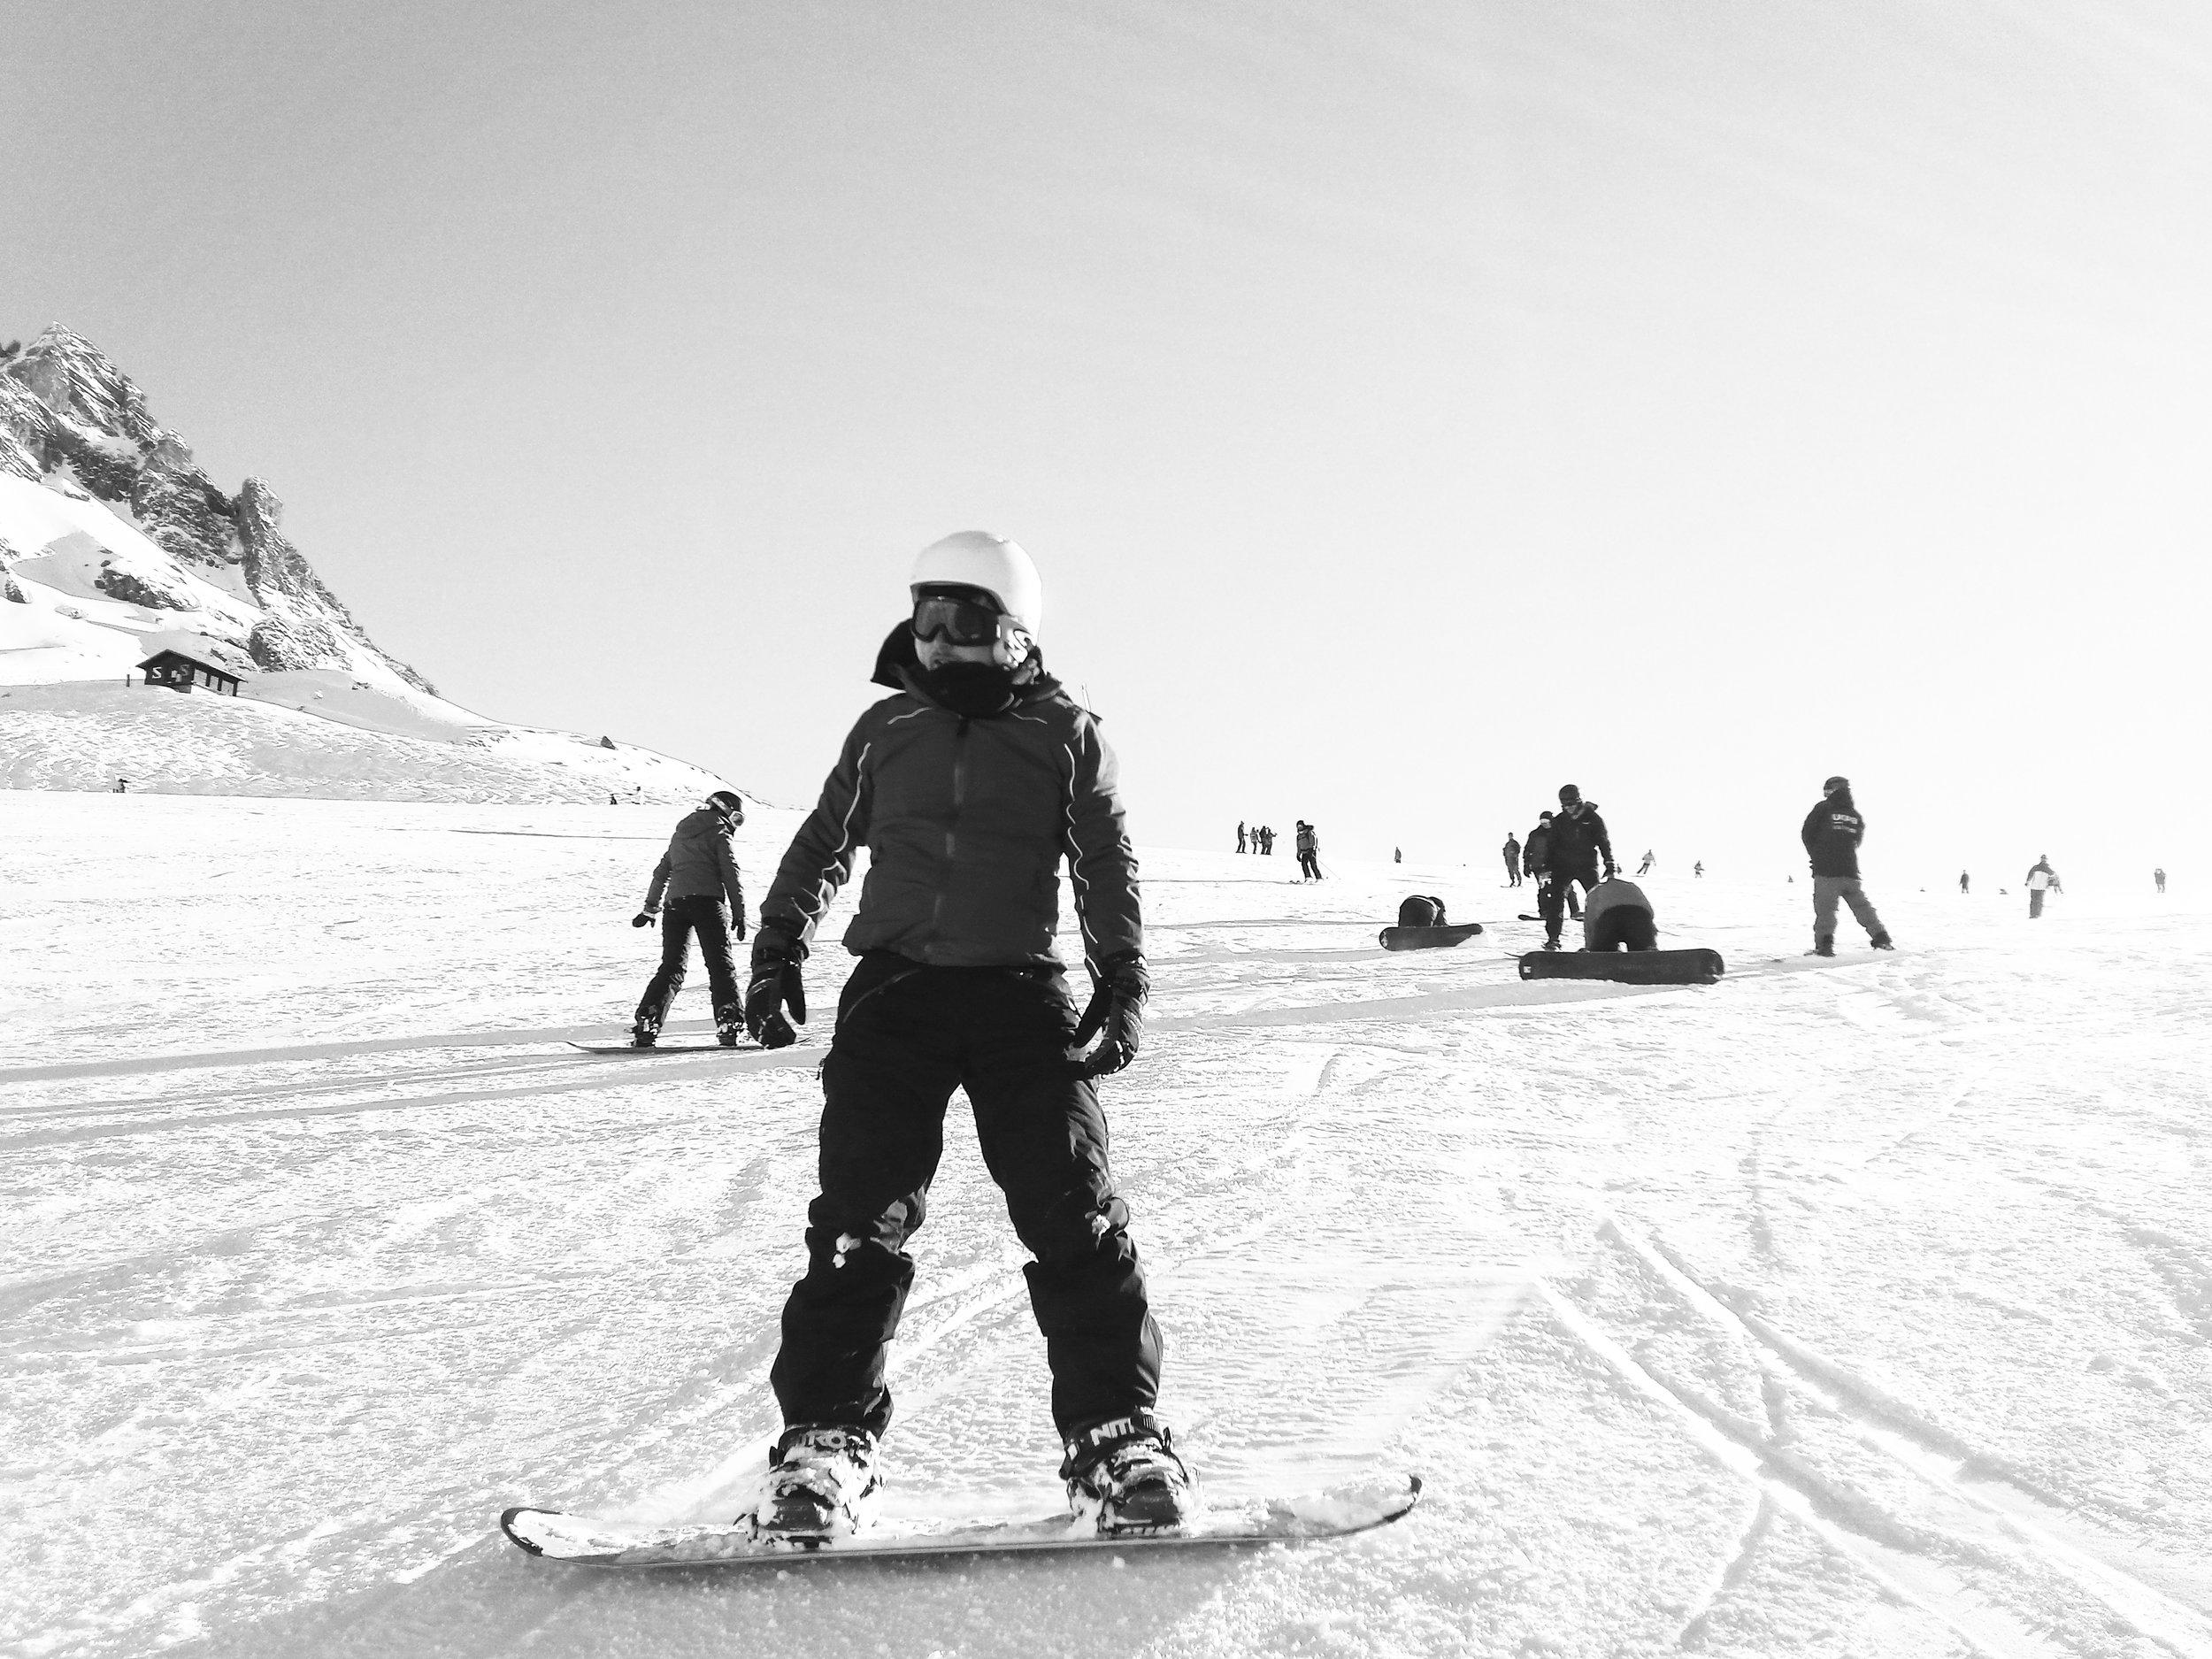 153201-val-d'Isère-snowboarding-ucpa.jpg